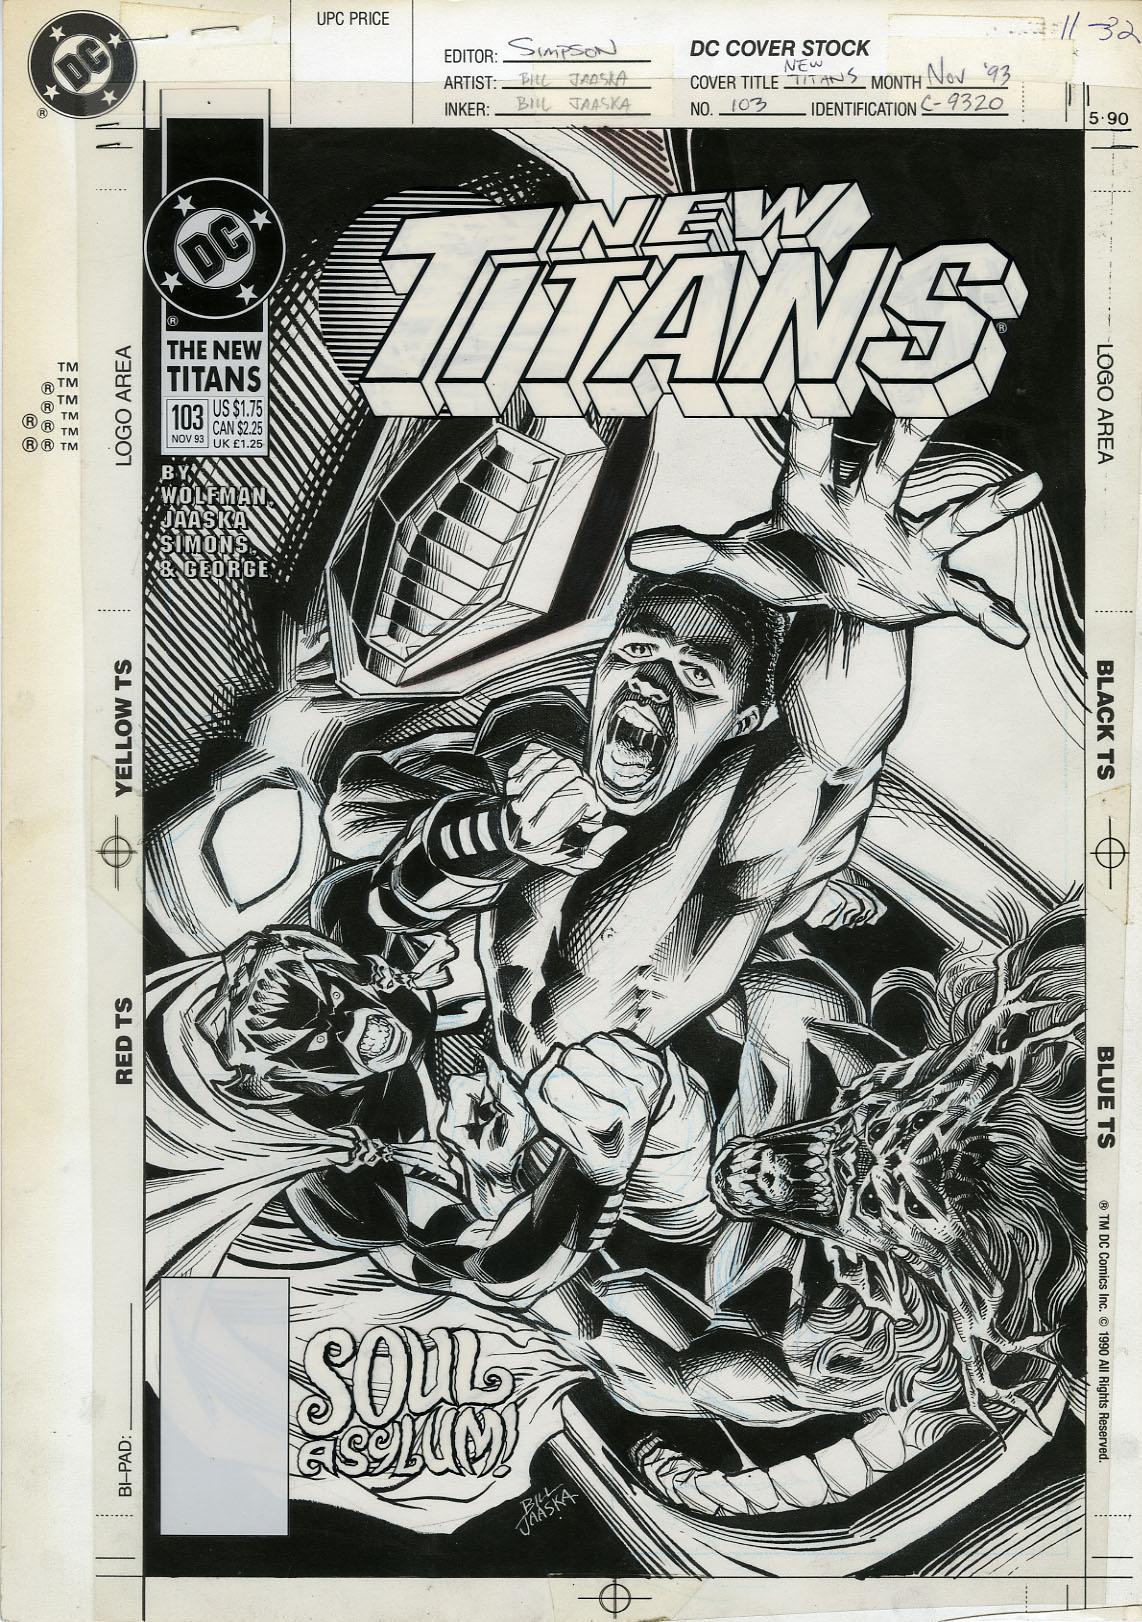 "BILL JAASKA - NEW TITANS #103 ORIGINAL COVER ART ""SOUL ASYLUM!"""